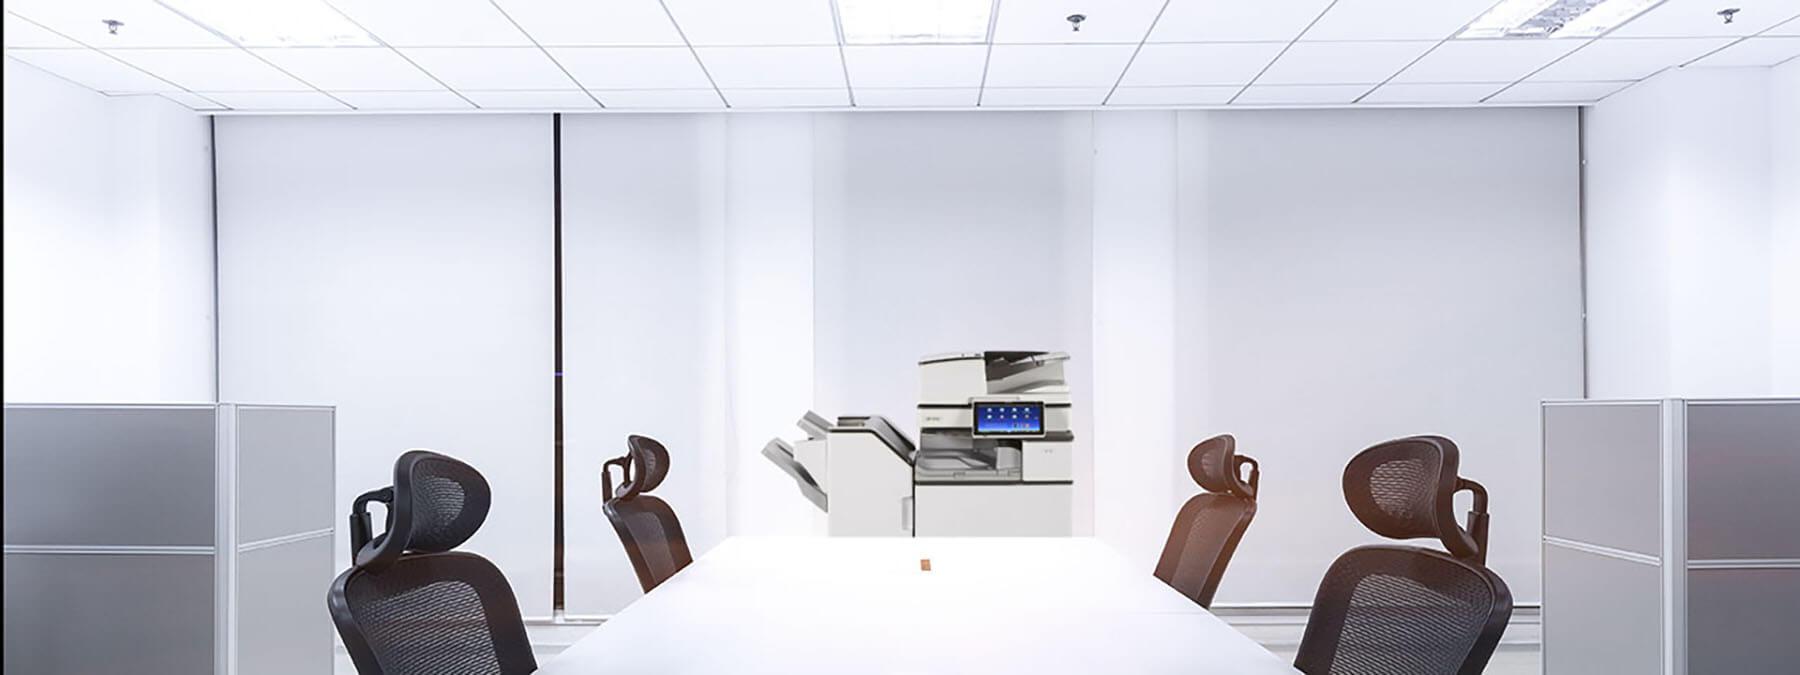 Lanier printer provided by EBP